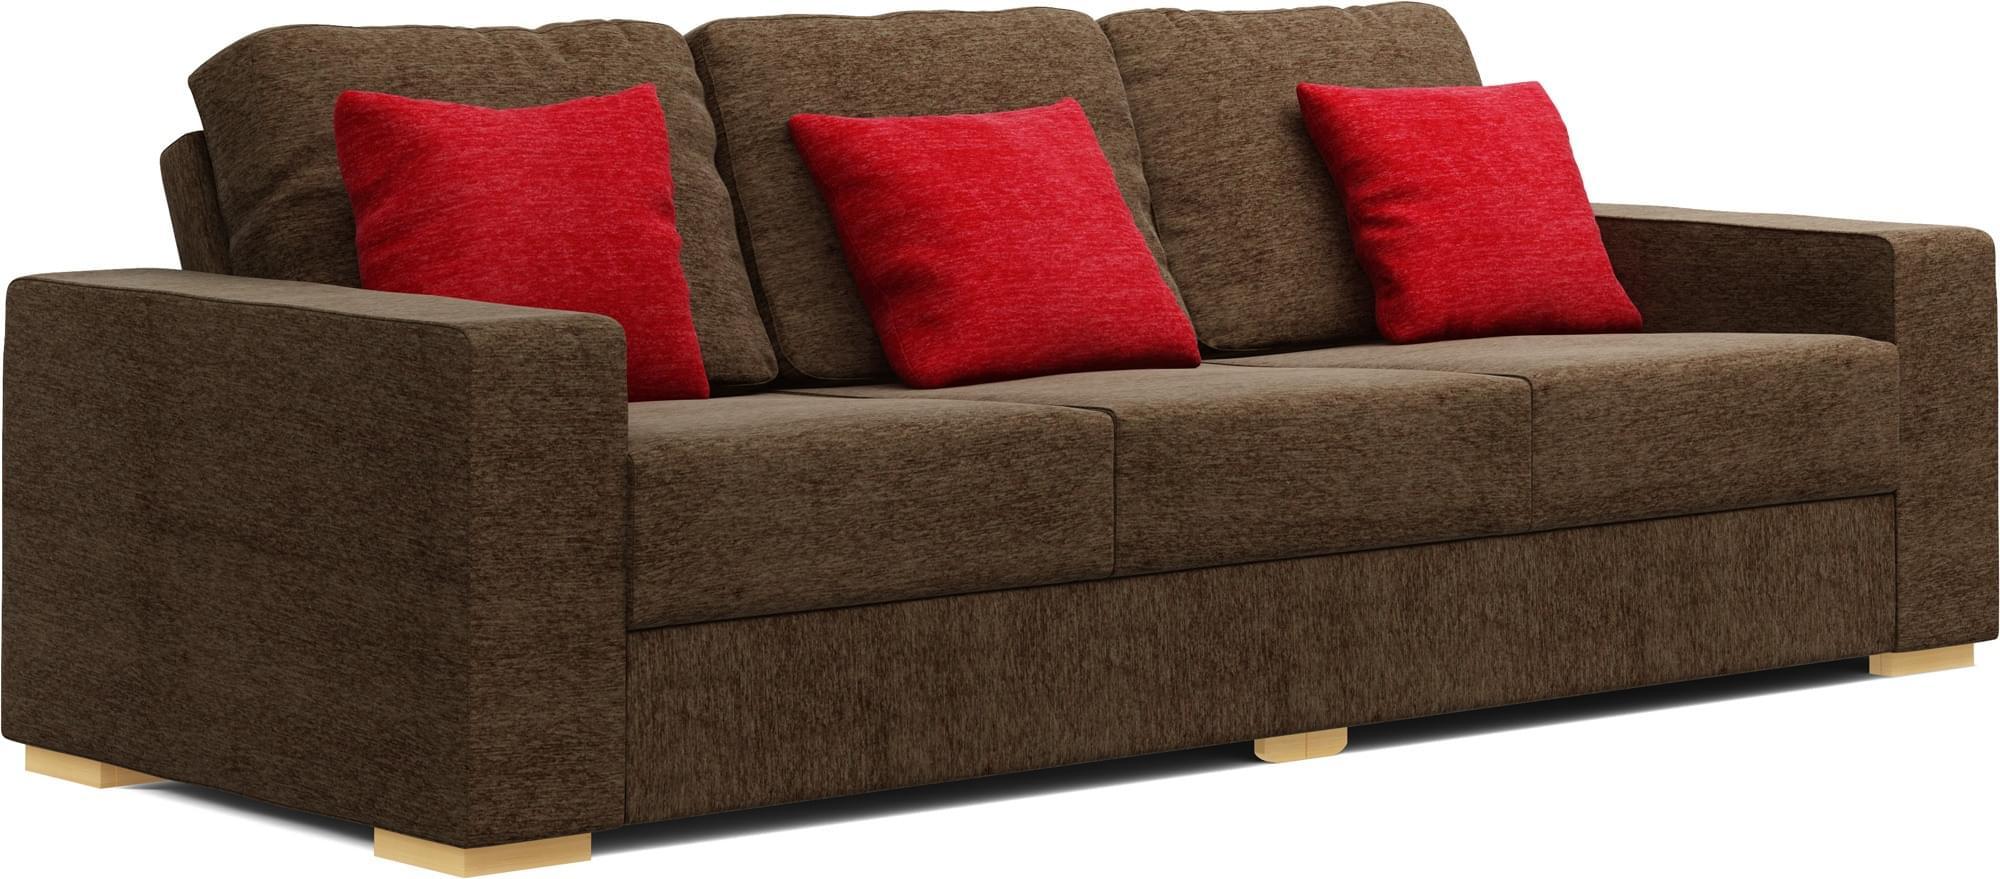 big chunky corner sofas michigan modular sofa next three seat 3 seater nabru